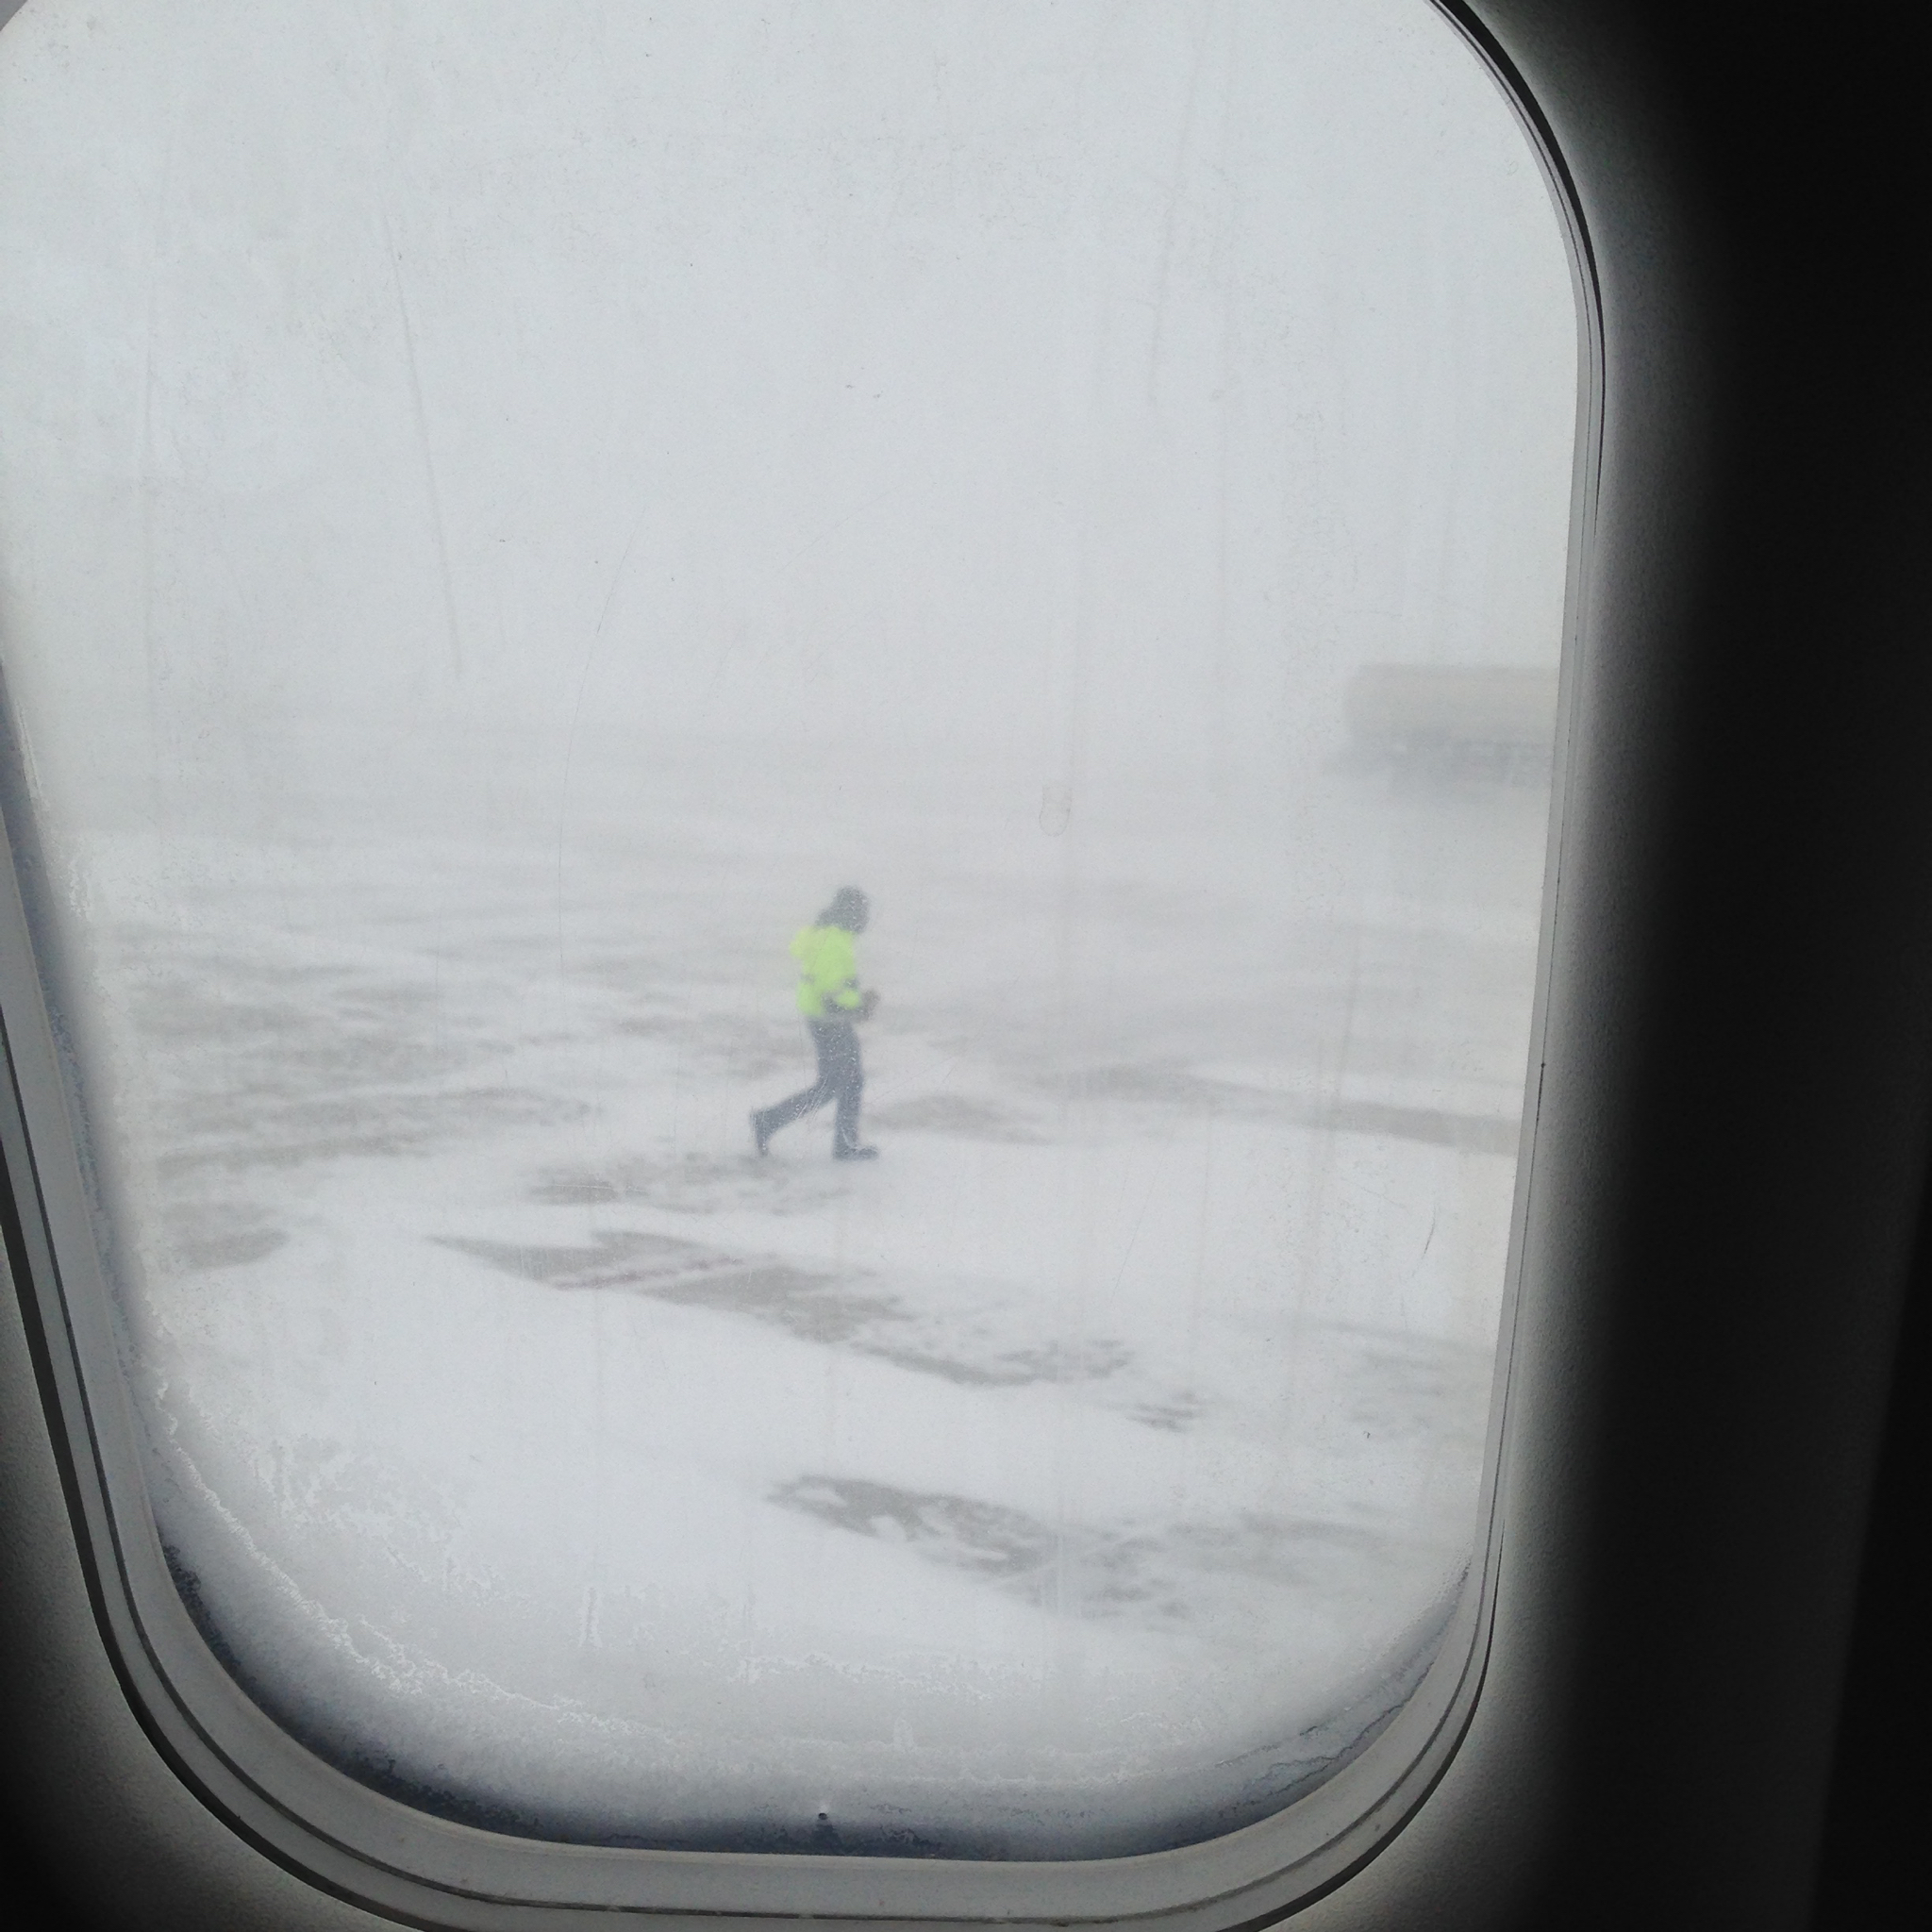 Rochester, Minnesota - January 8, 2015 - Landing just as a blizzard starts